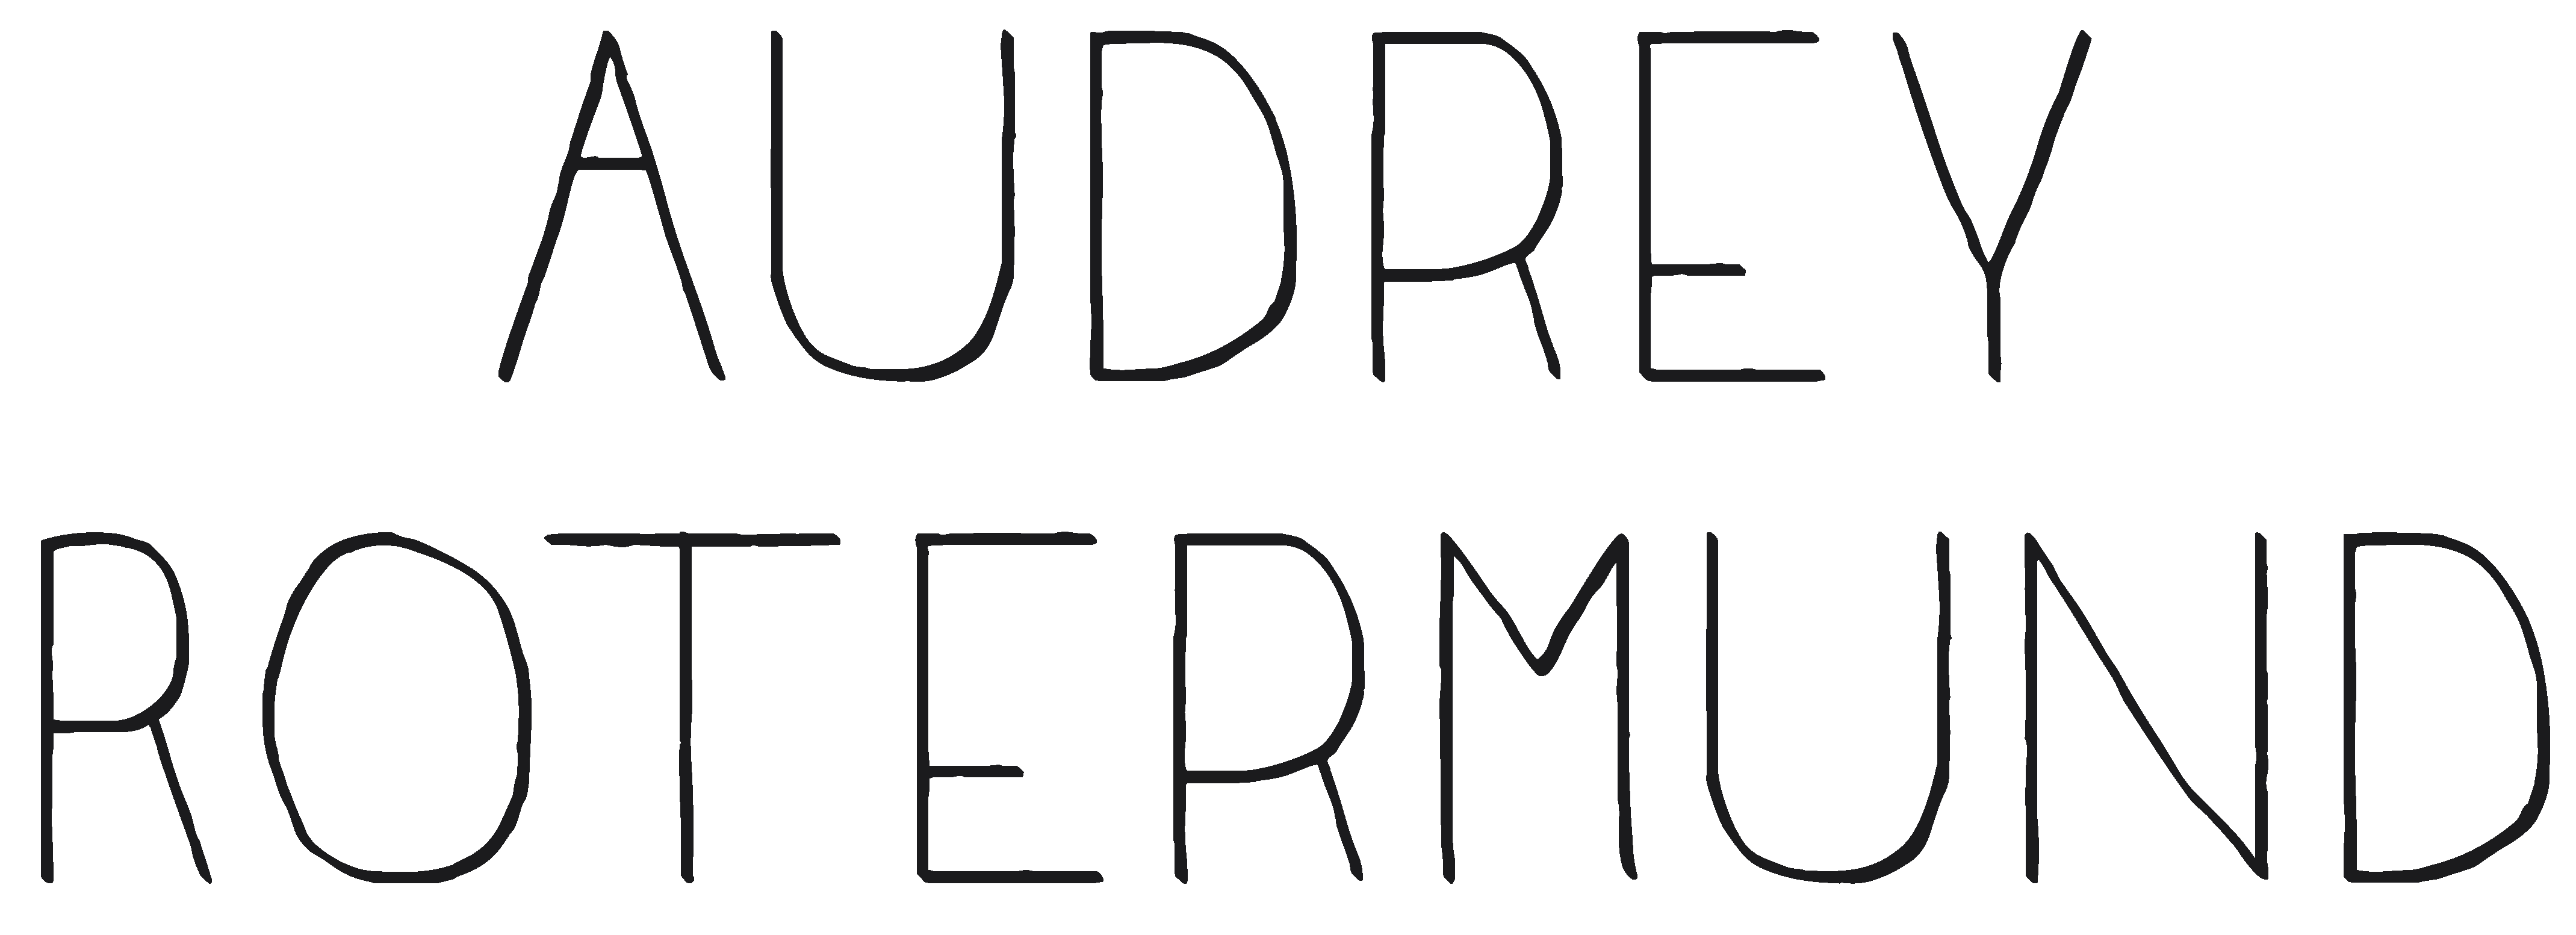 Audrey Rotermund